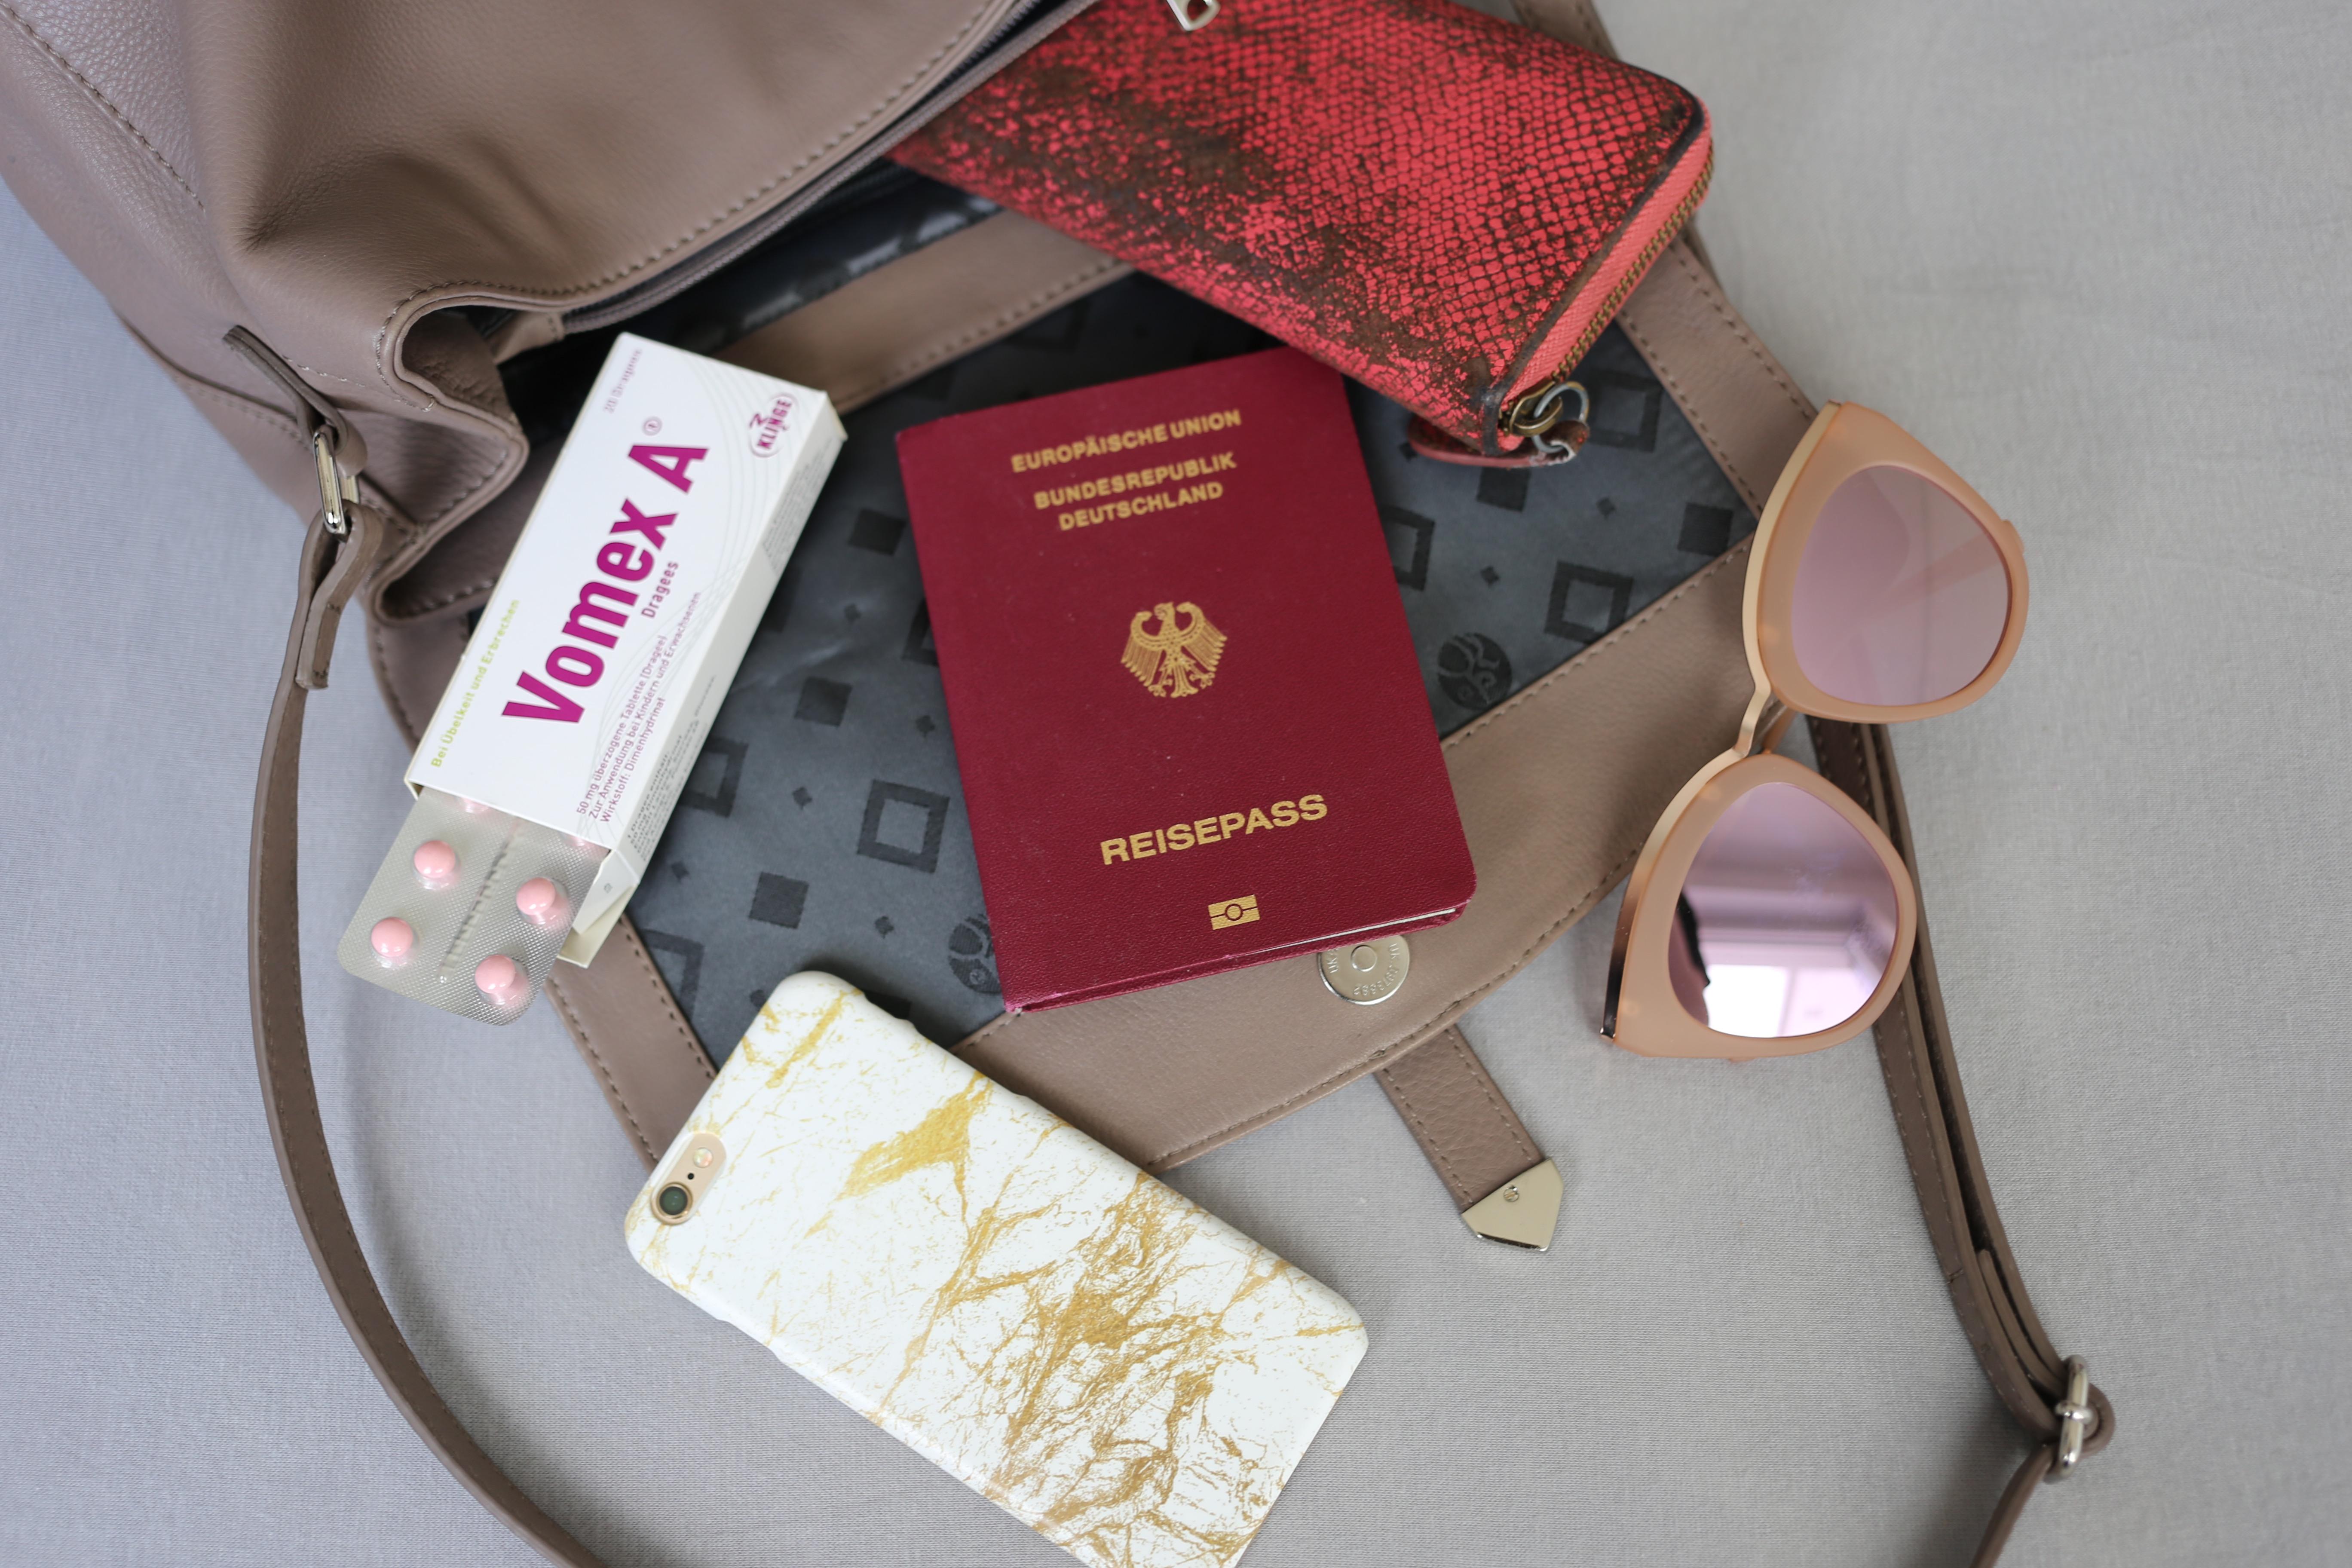 bus-tour-spanien-marokko-gibraltar-reiseblog-travelblog-reiseübelkeit-tipps-road-trip_0550